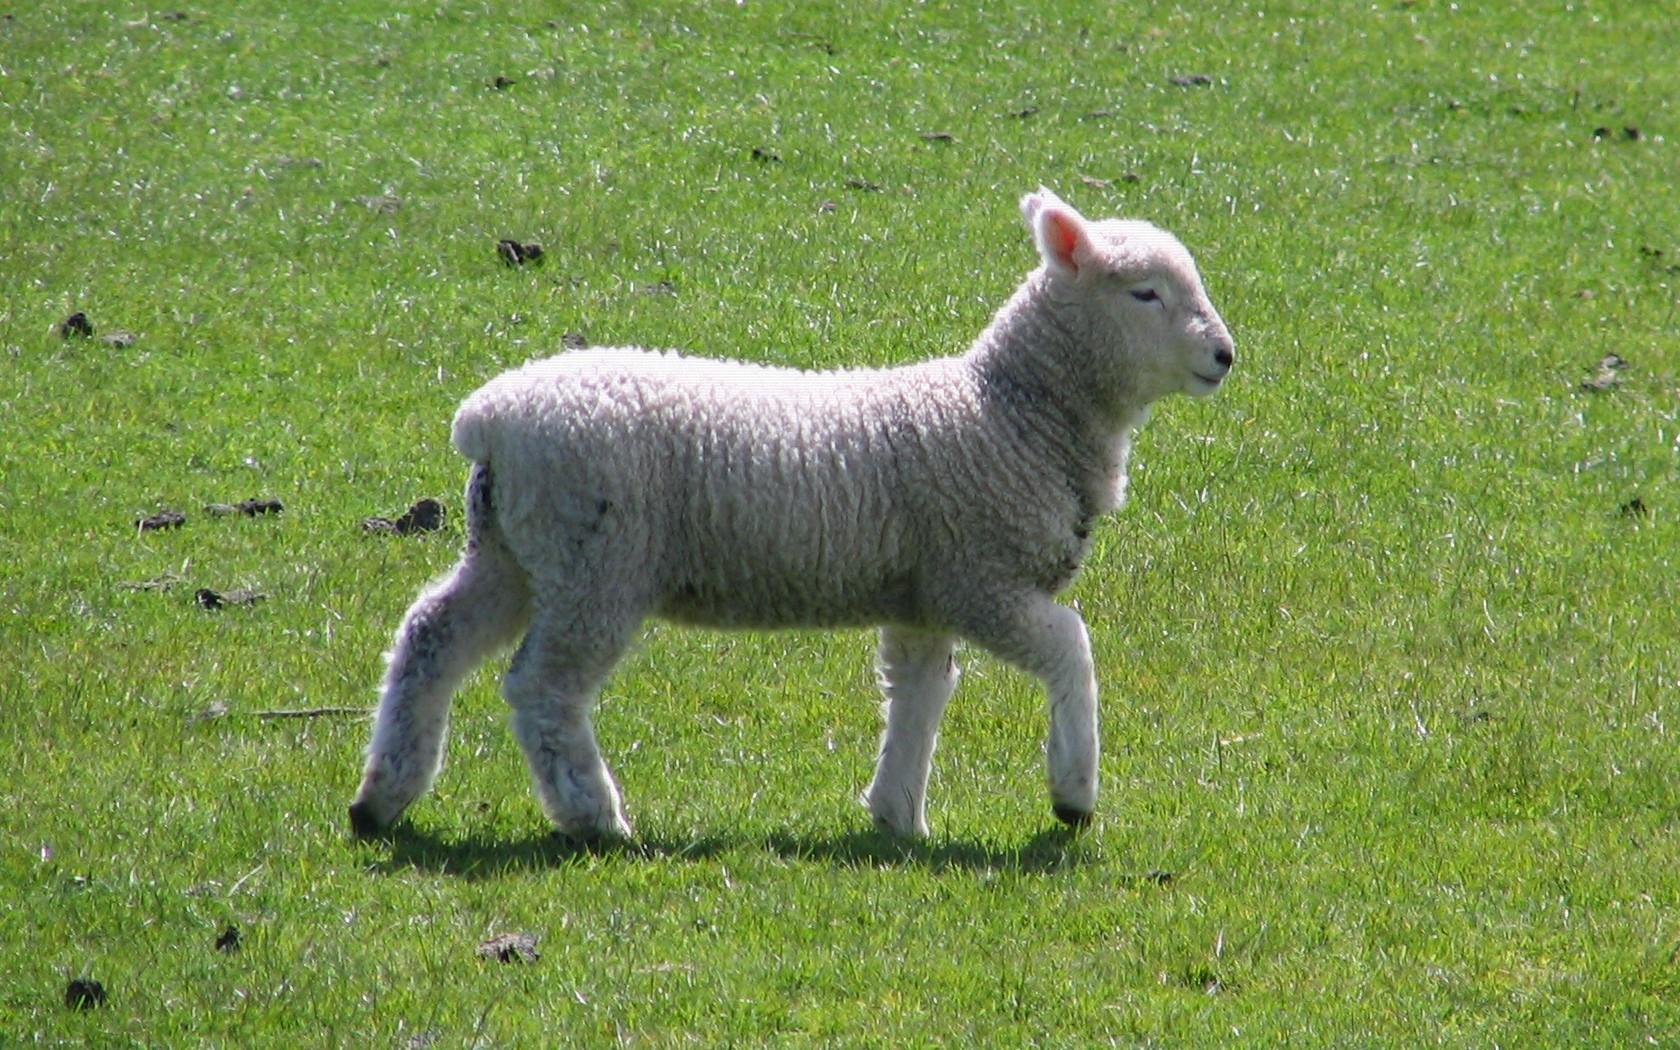 File:Dunedin lamb spring 2008.jpg